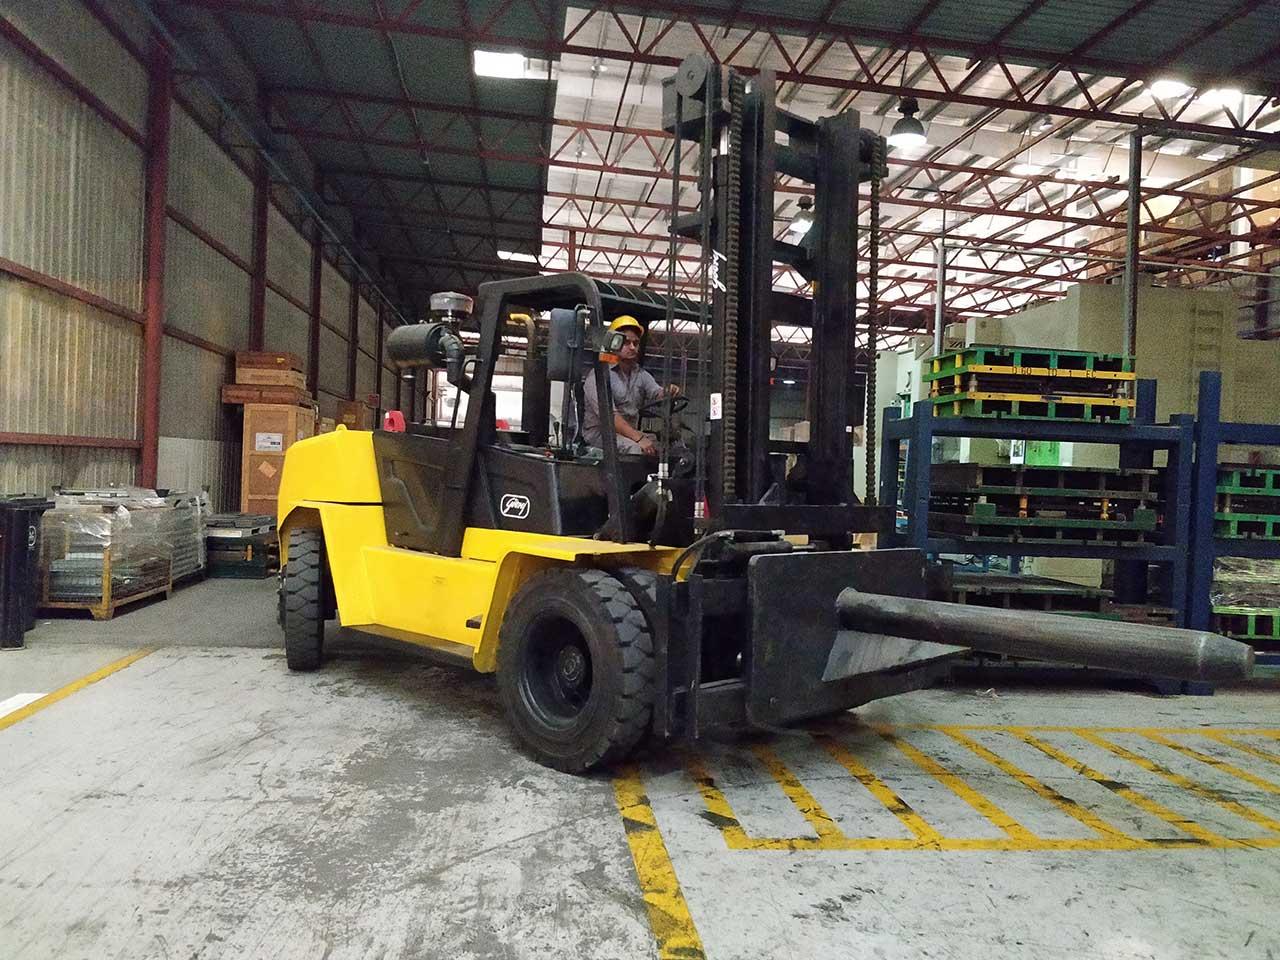 Godrej RenTRUST | Widest range of equipment range to handle all your